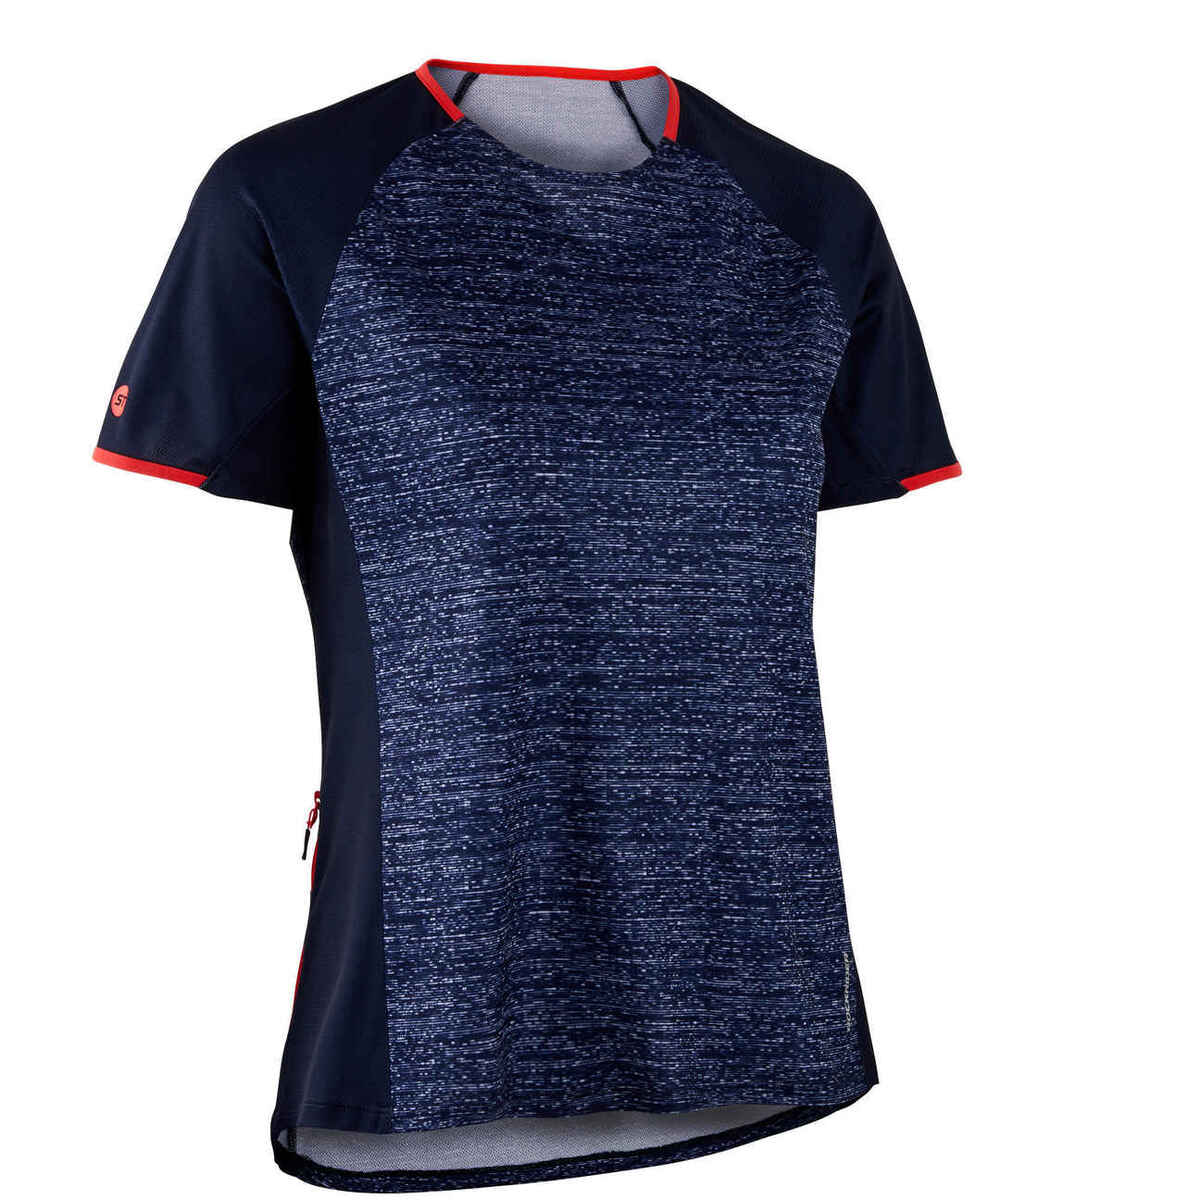 Bild 1 von Radtrikot kurzarm MTB ST 100 Damen marineblau